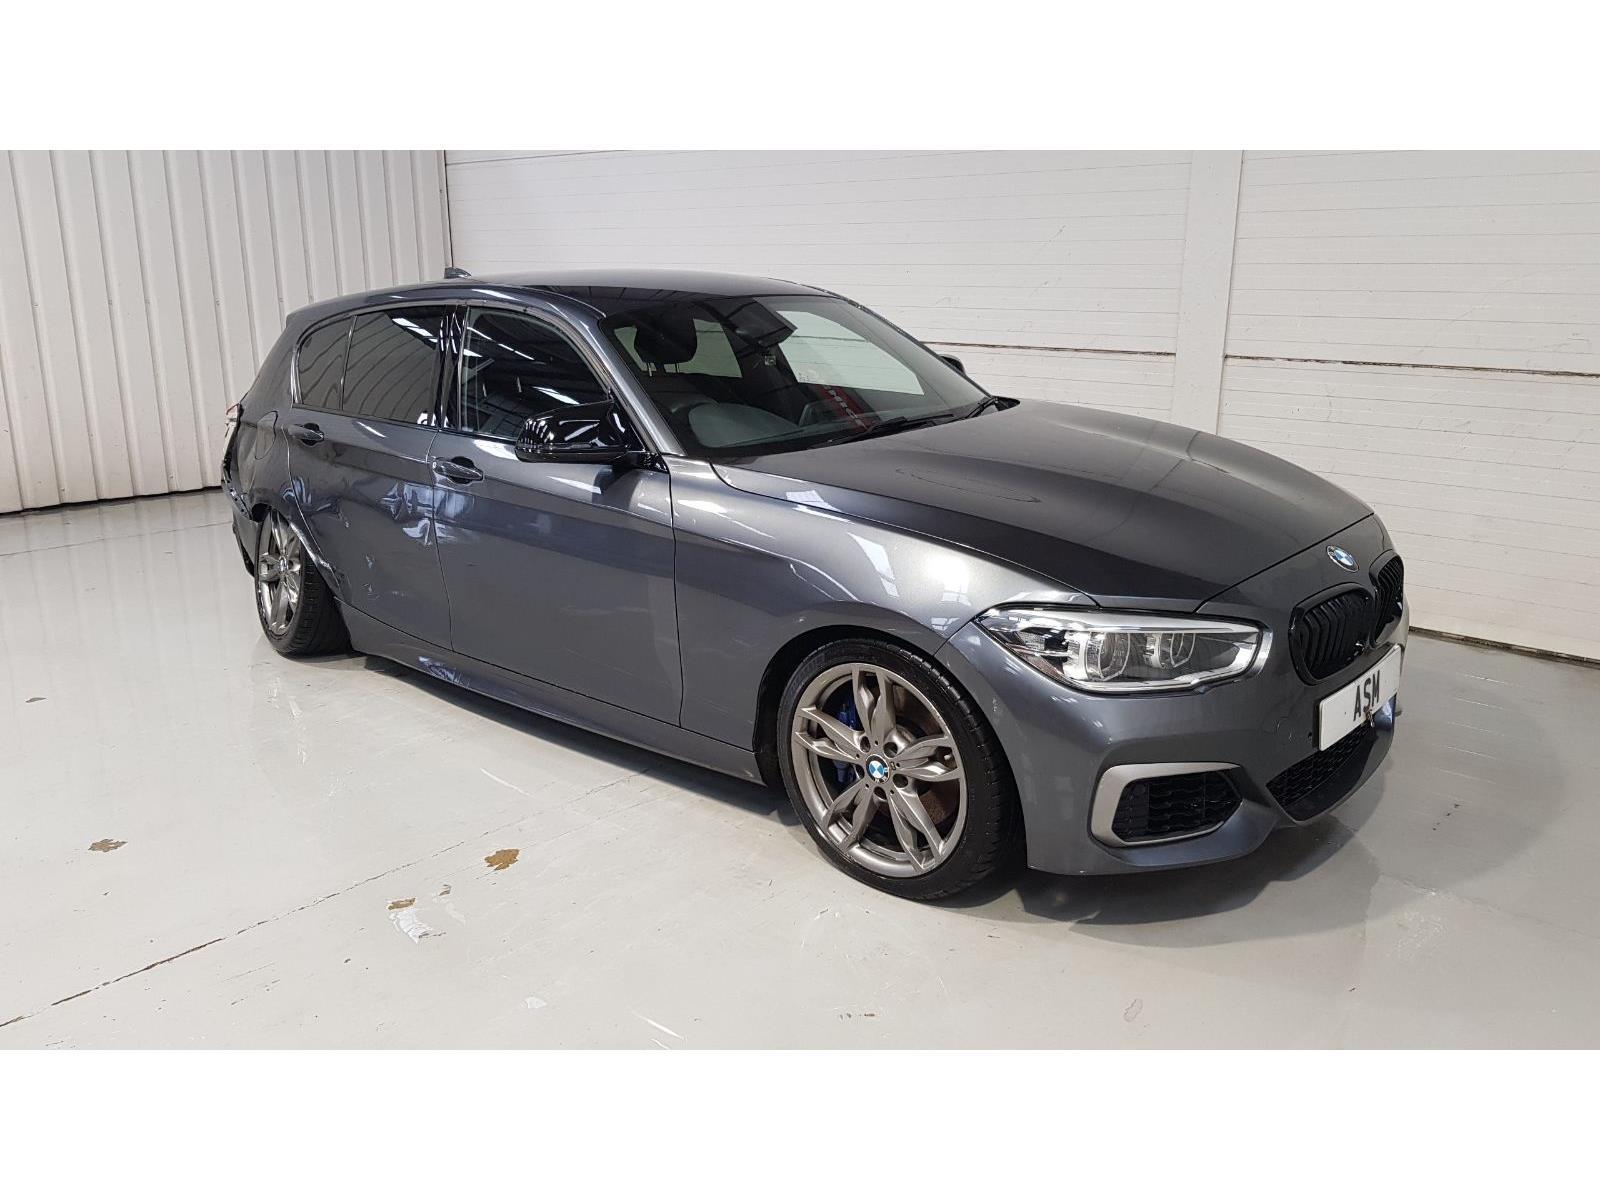 2016 BMW 1 Series M140i 2998cc Turbo Petrol Automatic 8 Speed 5 Door Hatchback